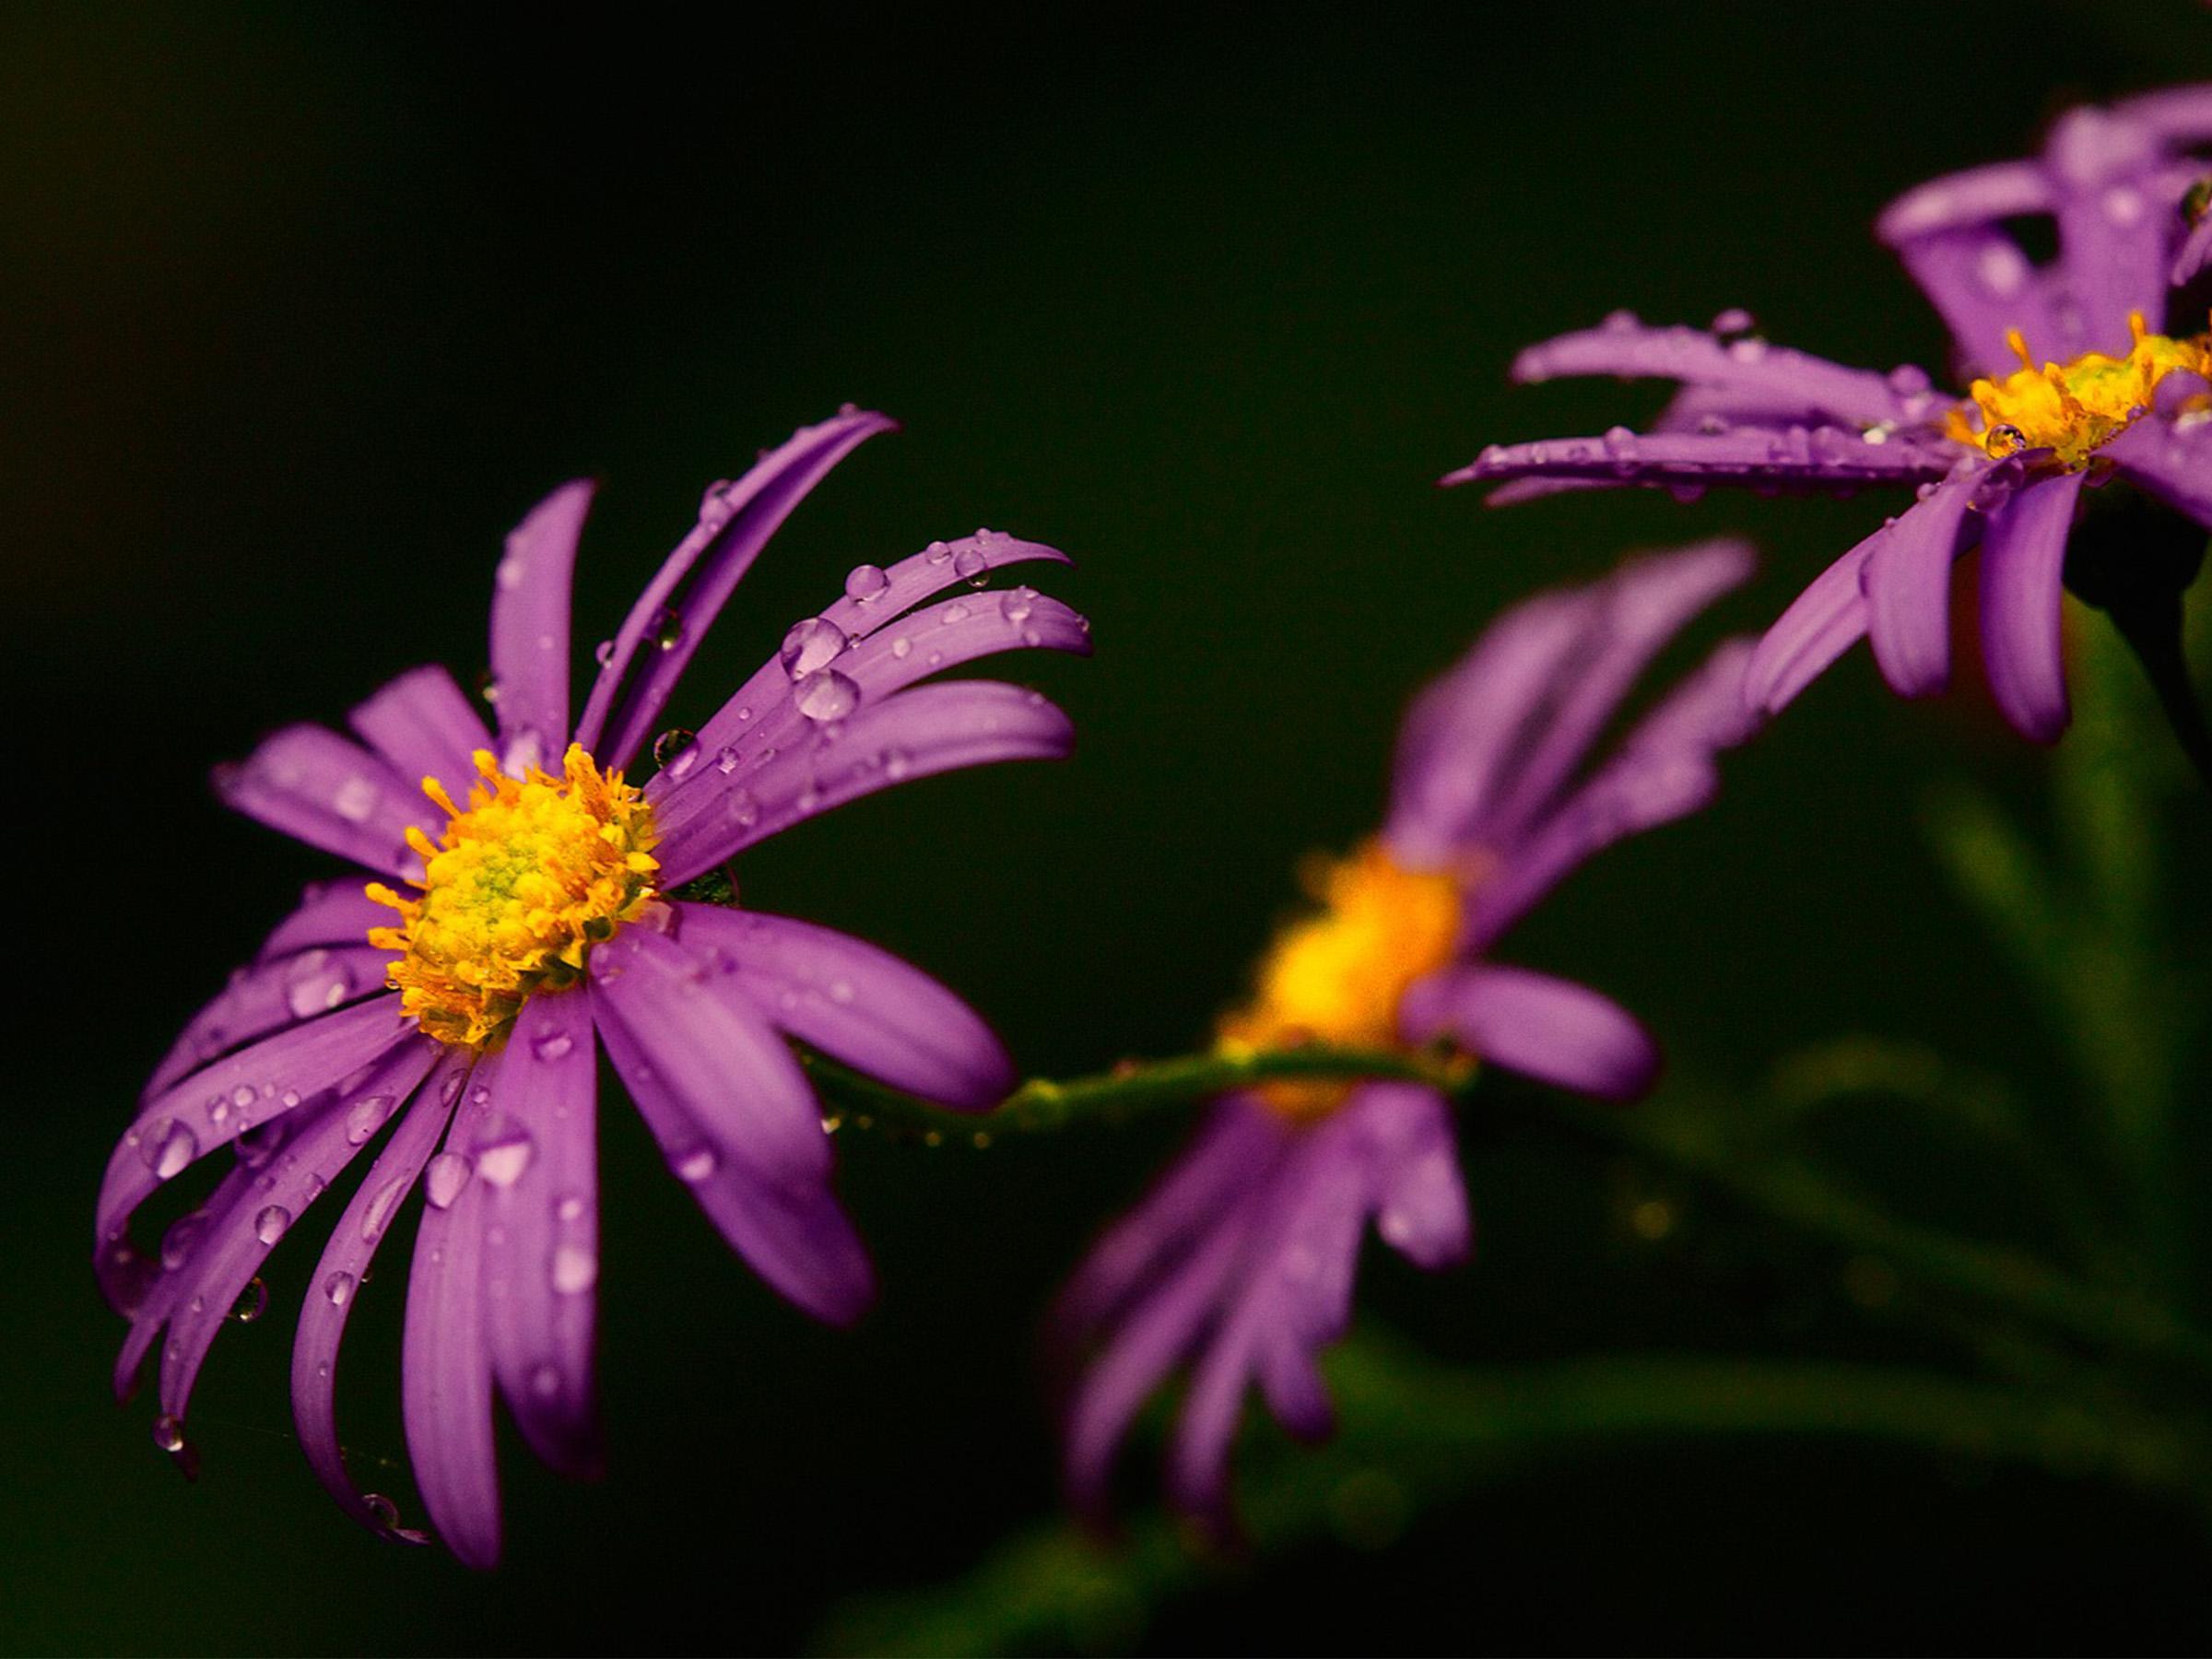 Cute Cartoon Fall Wallpaper Macro Water Drops On The Purple Flower Spring Perfume